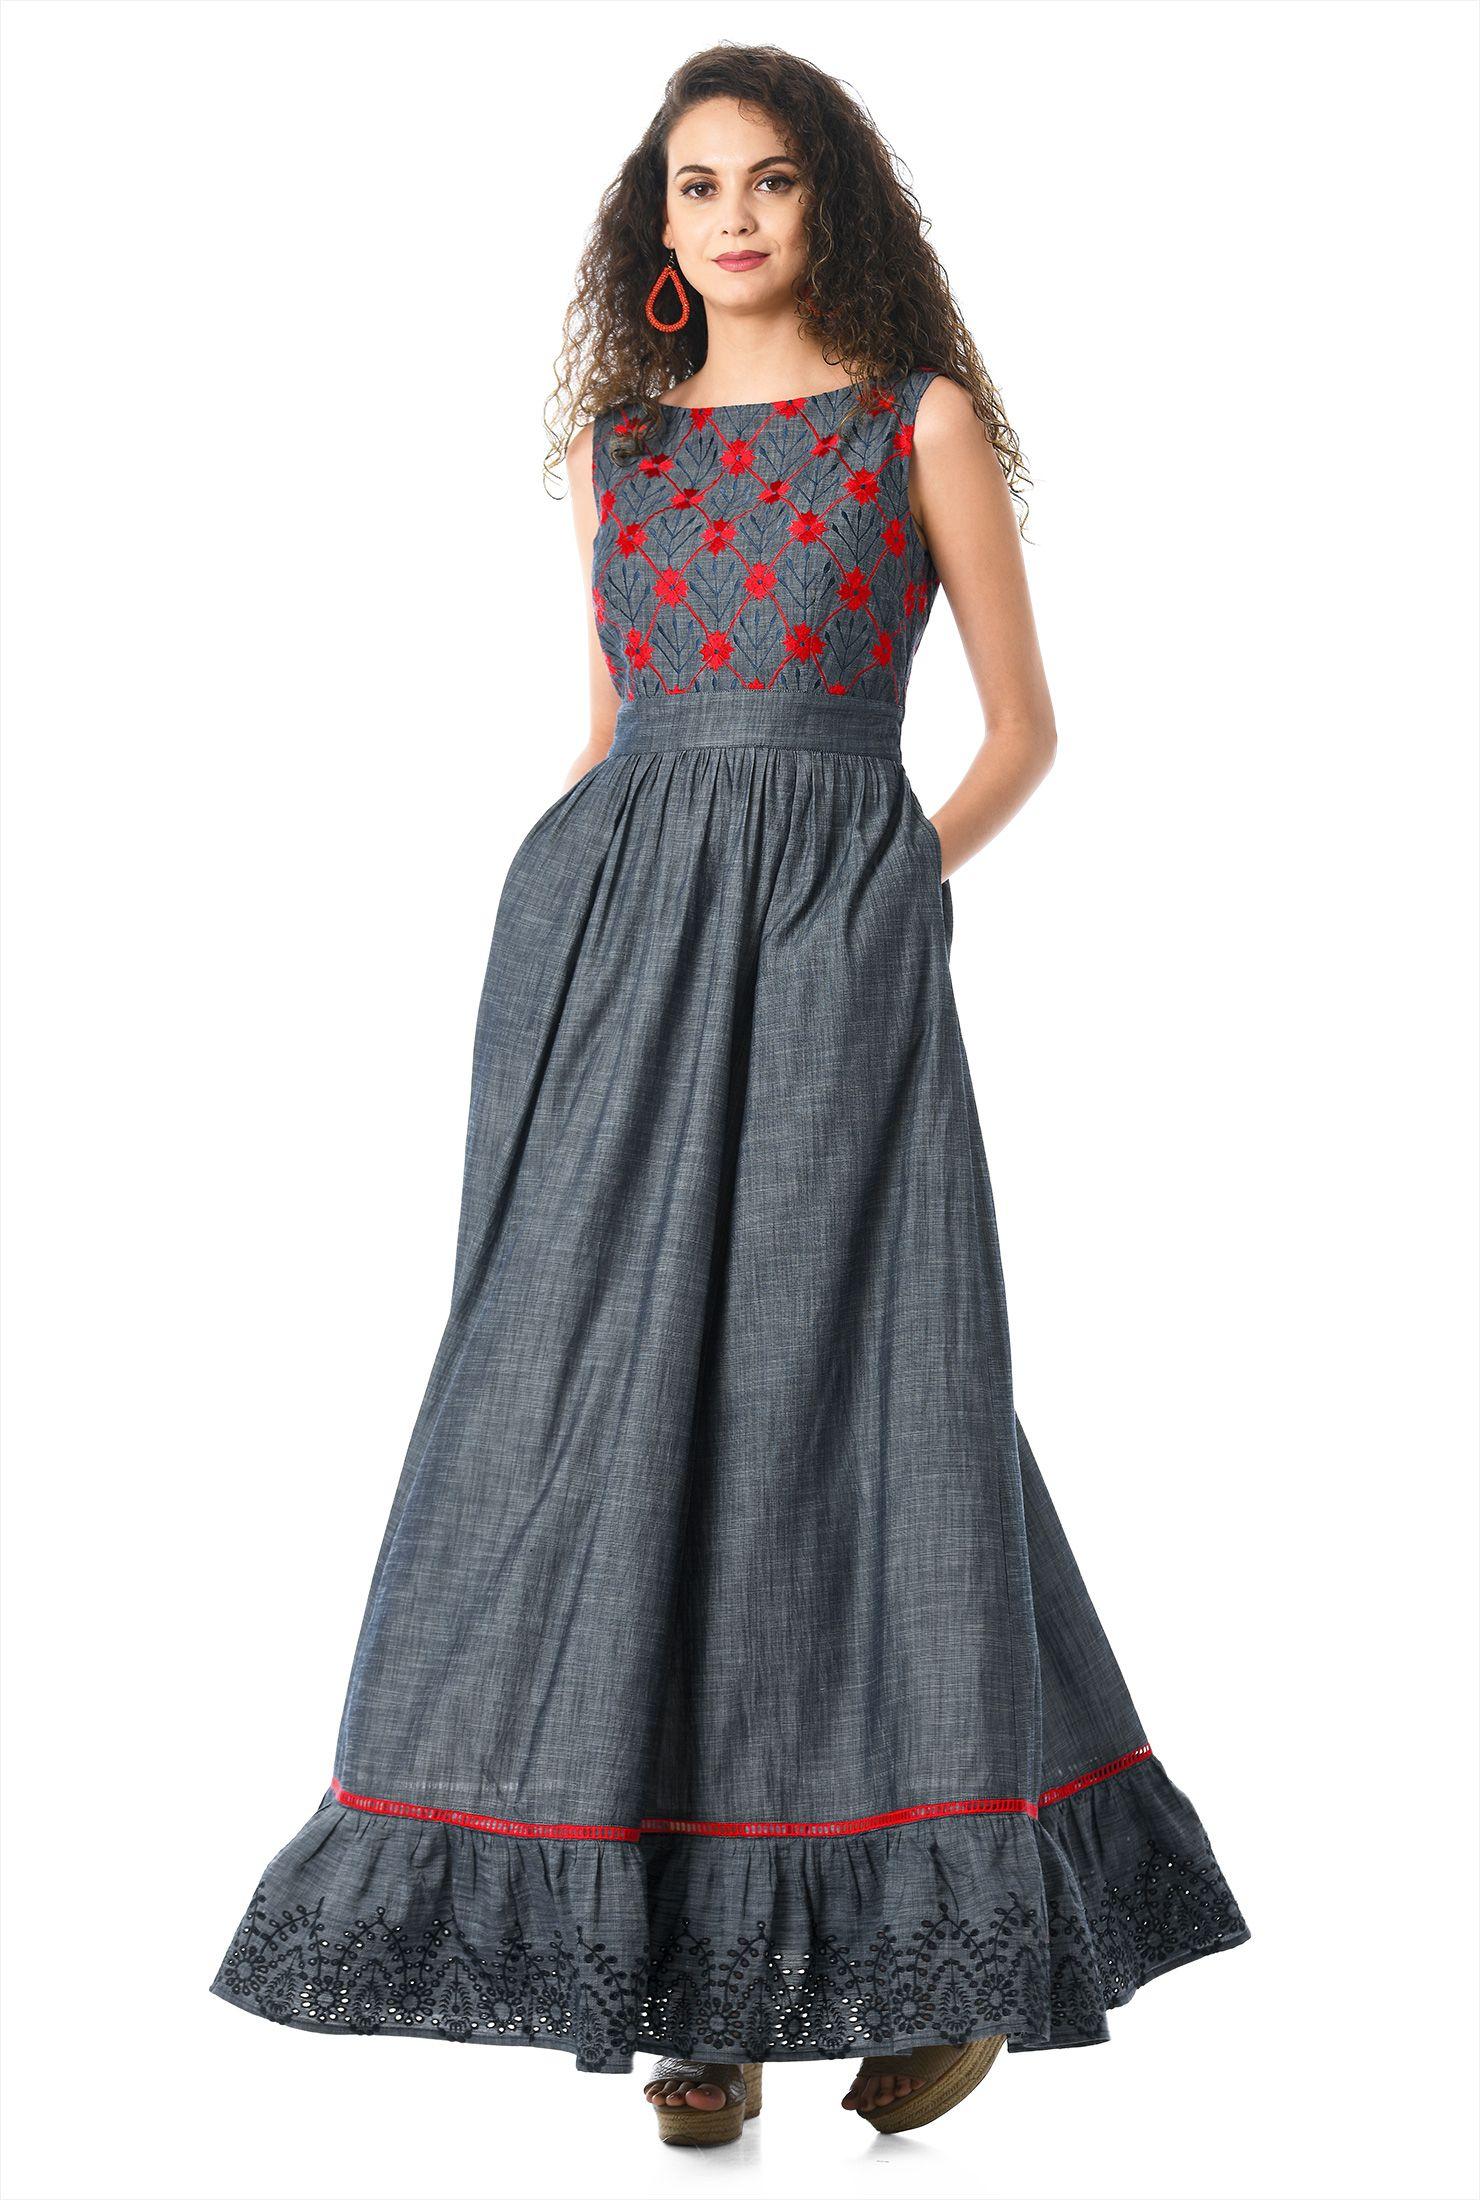 28fca95fd8d The perfect Empire Waist Dresses are at eShakti